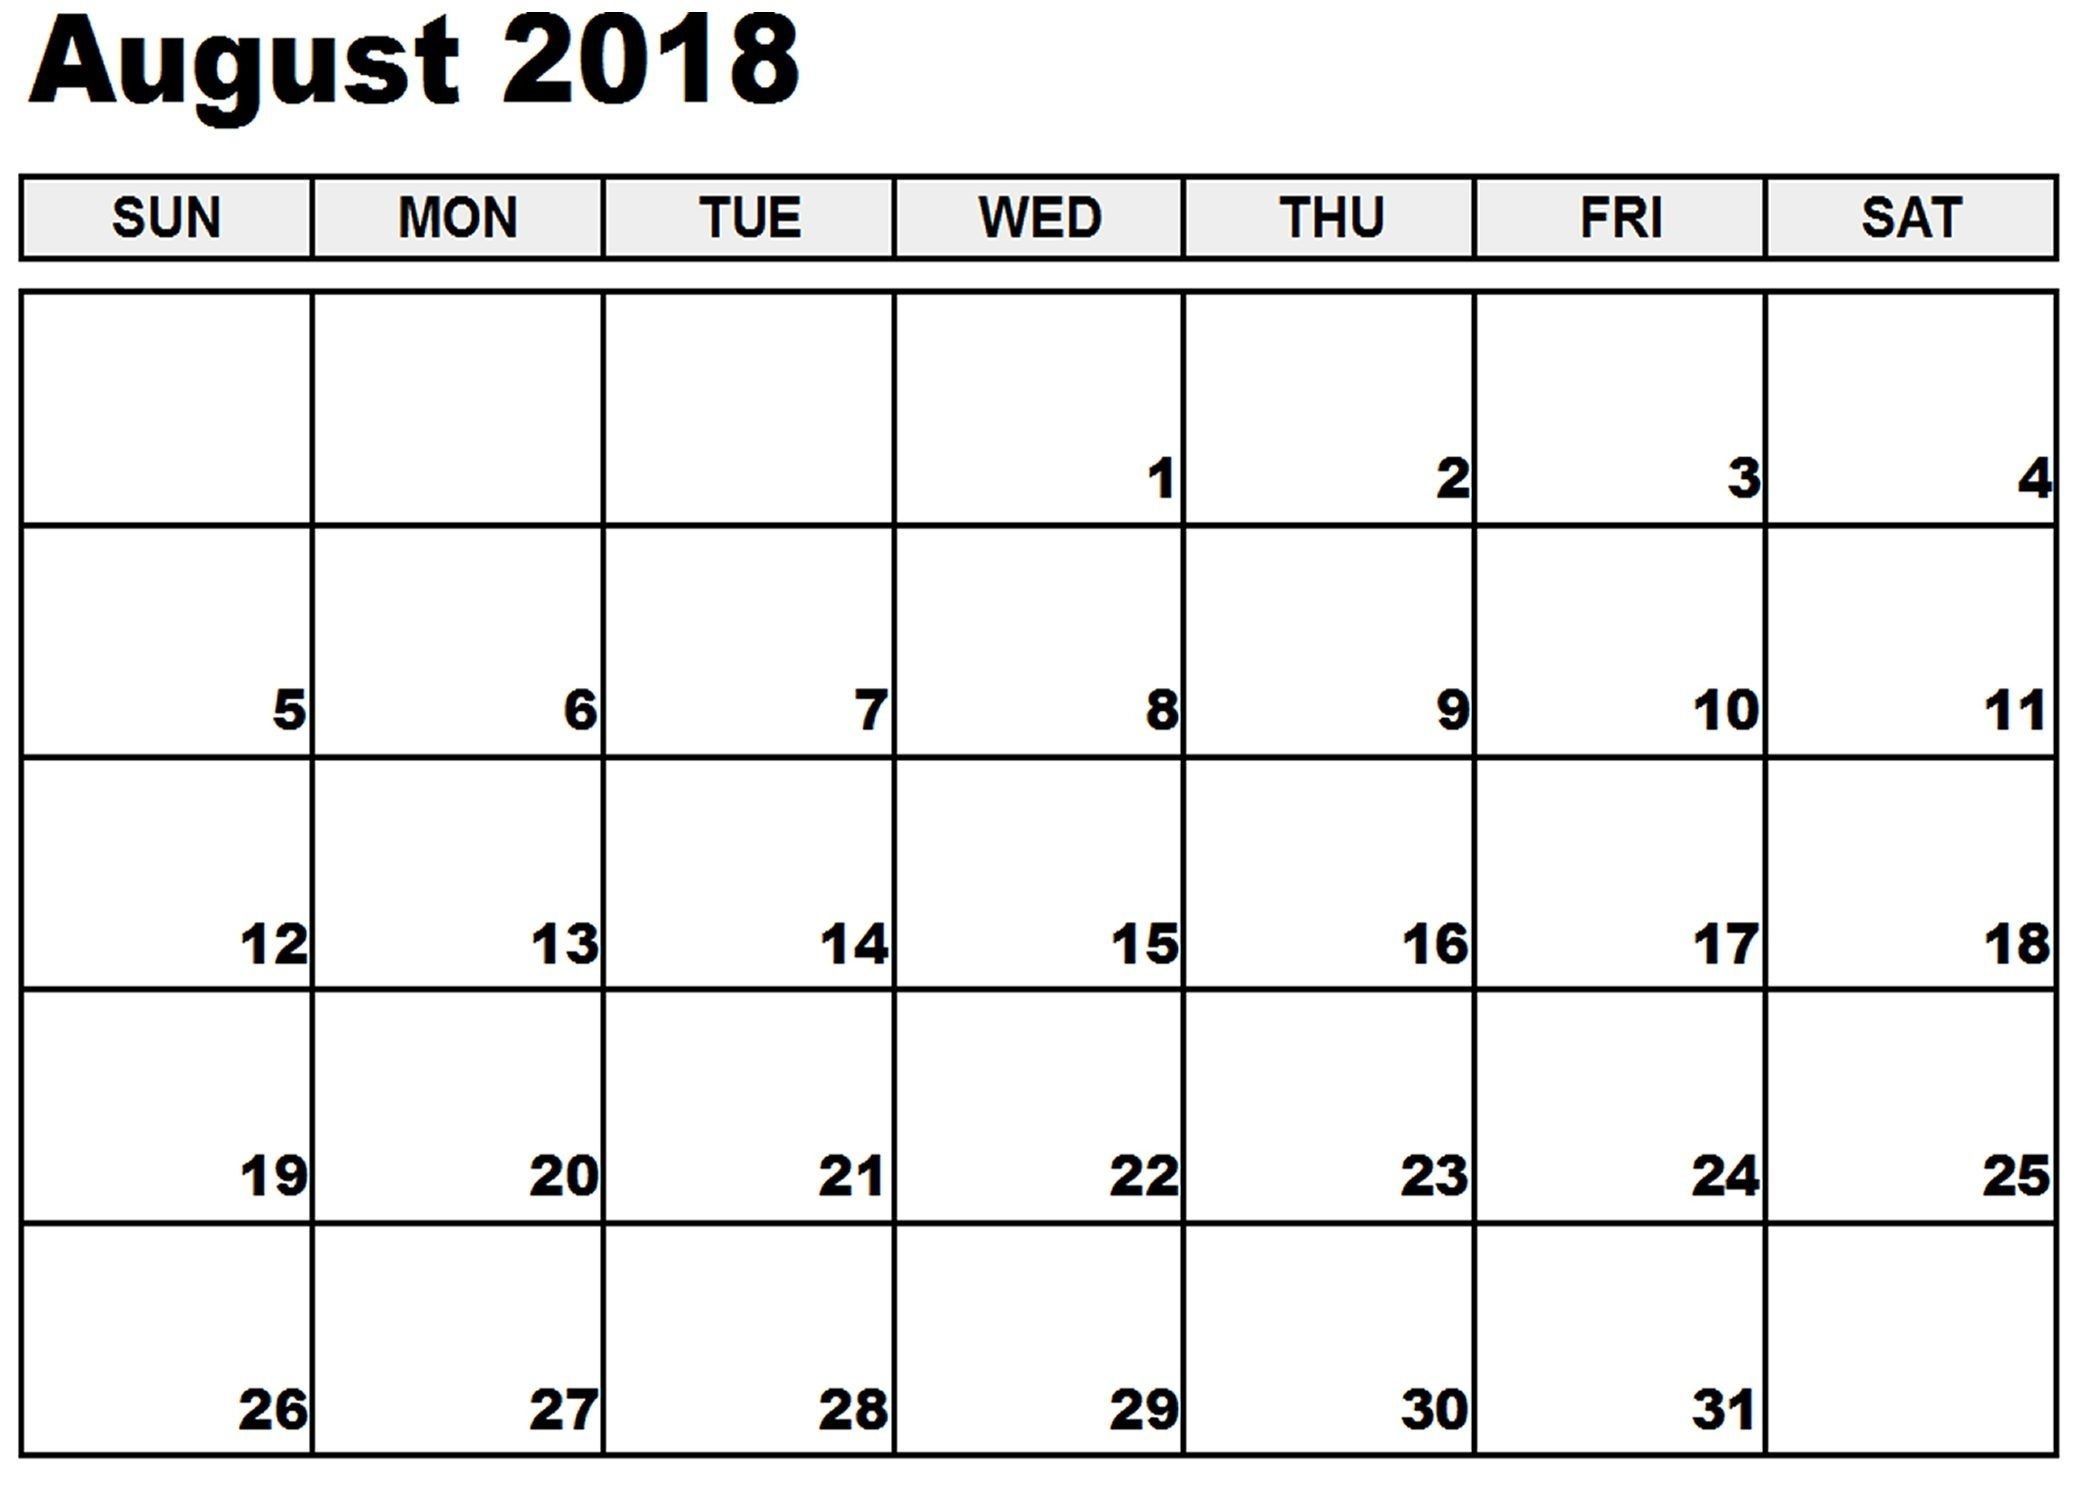 August 2018 Calendar August 2018 Calendar Word August 2018